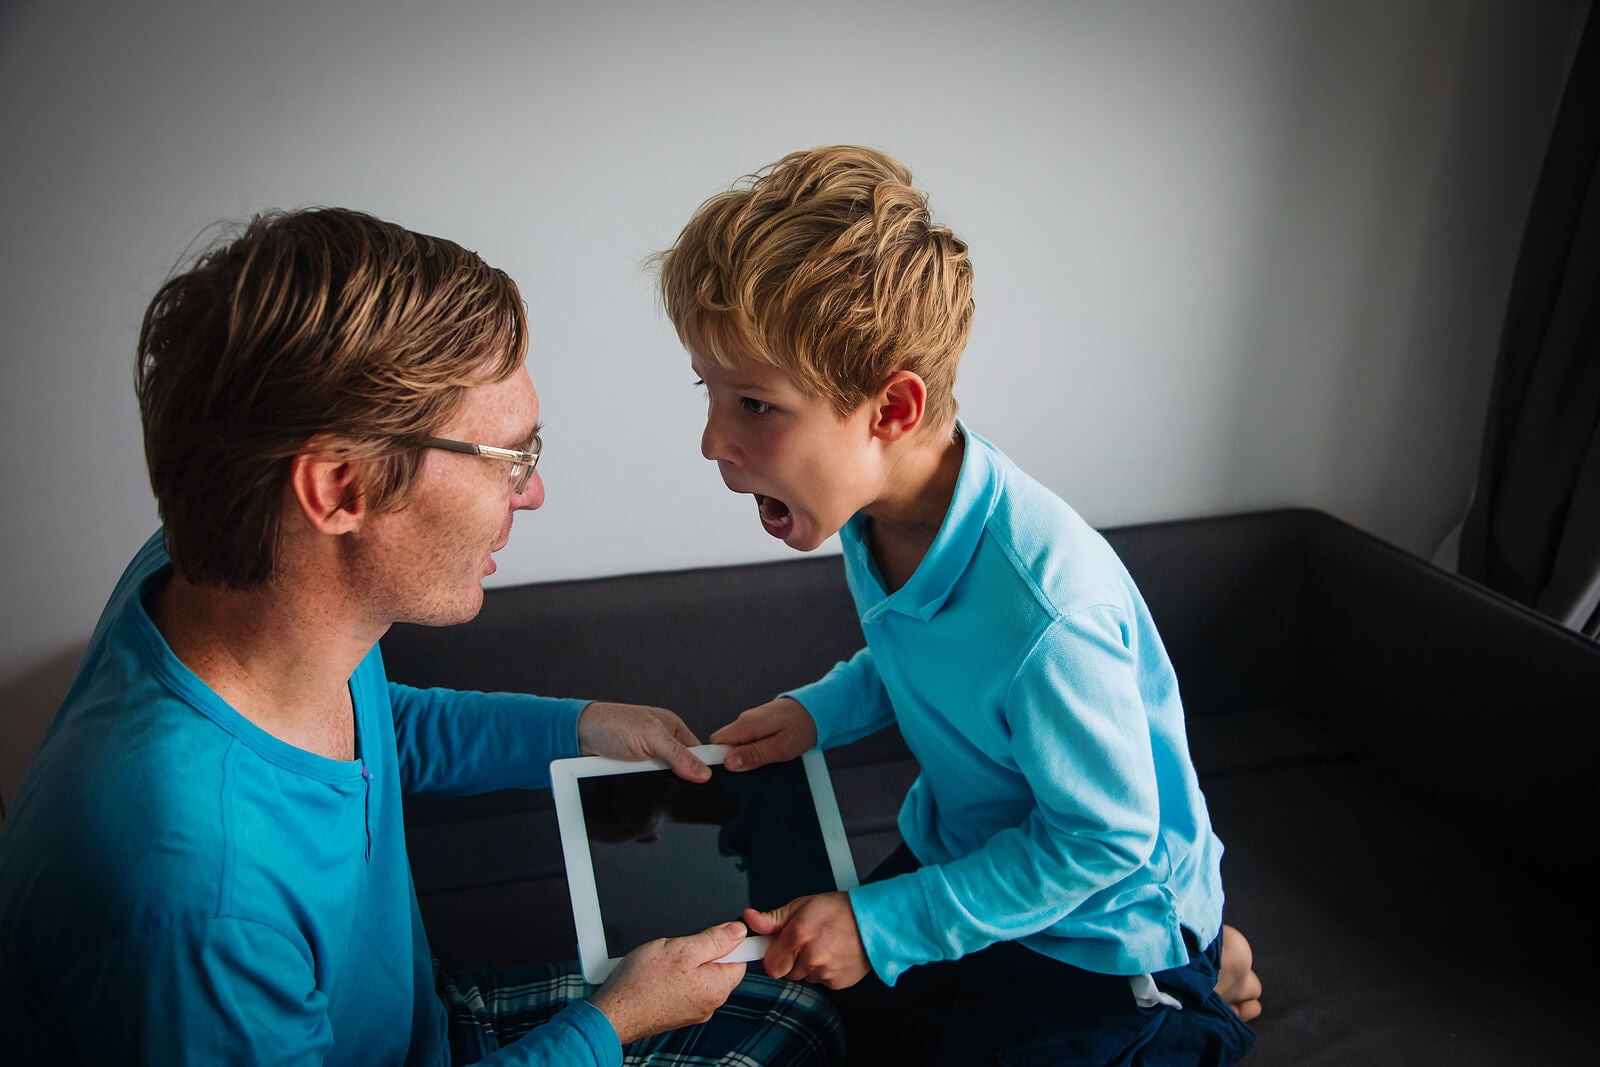 Padre e hija discutiendo por la tablet.